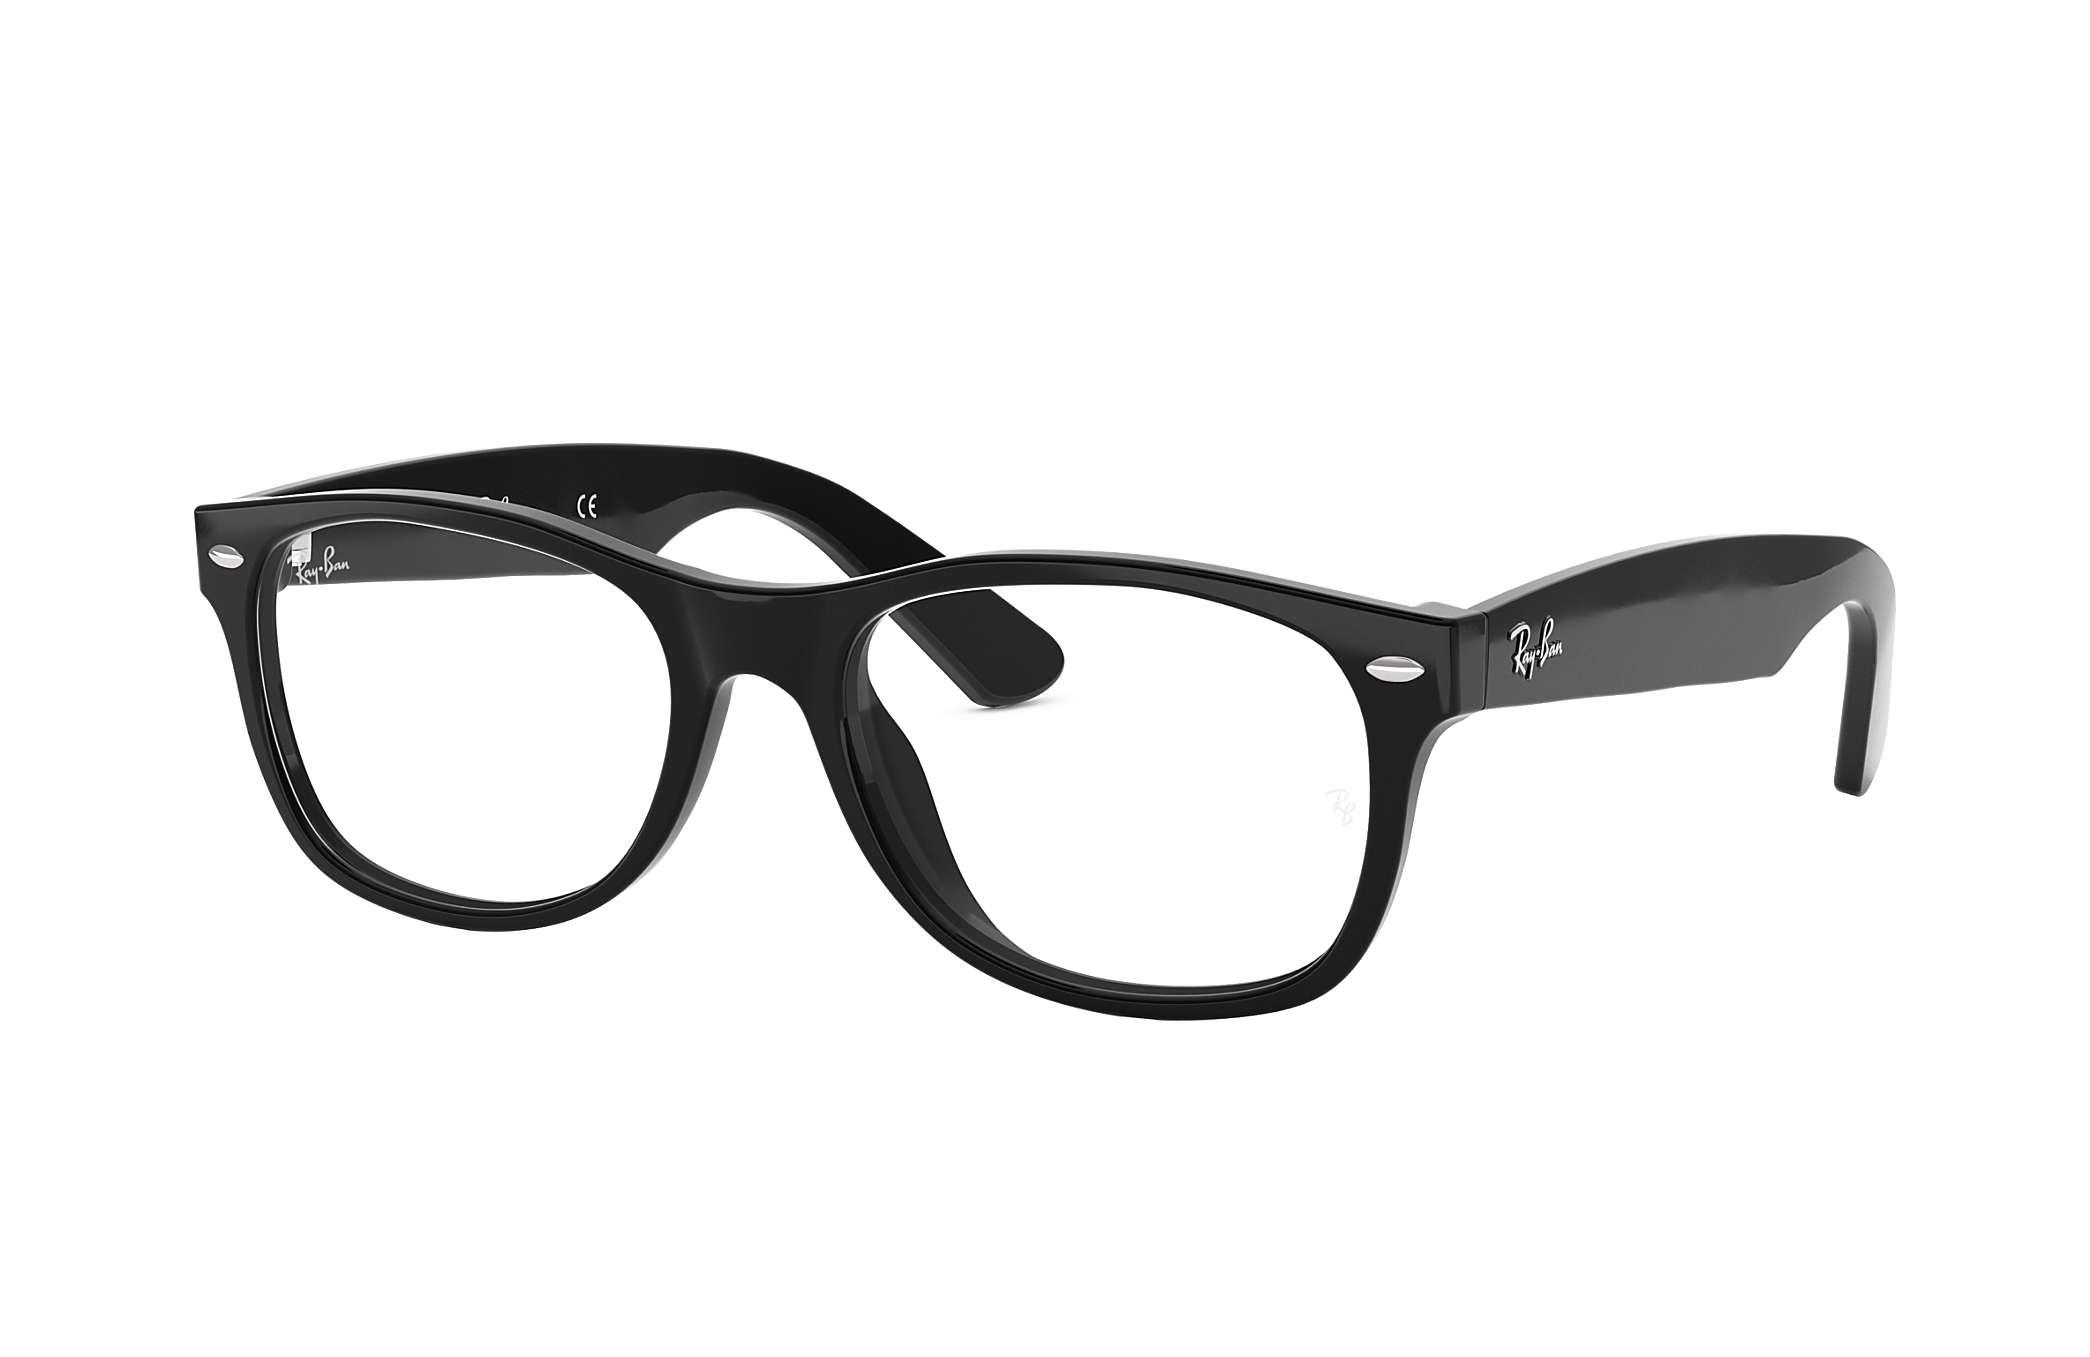 a8aaea7552 Ray-Ban prescription glasses New Wayfarer Optics RB5184 Black ...